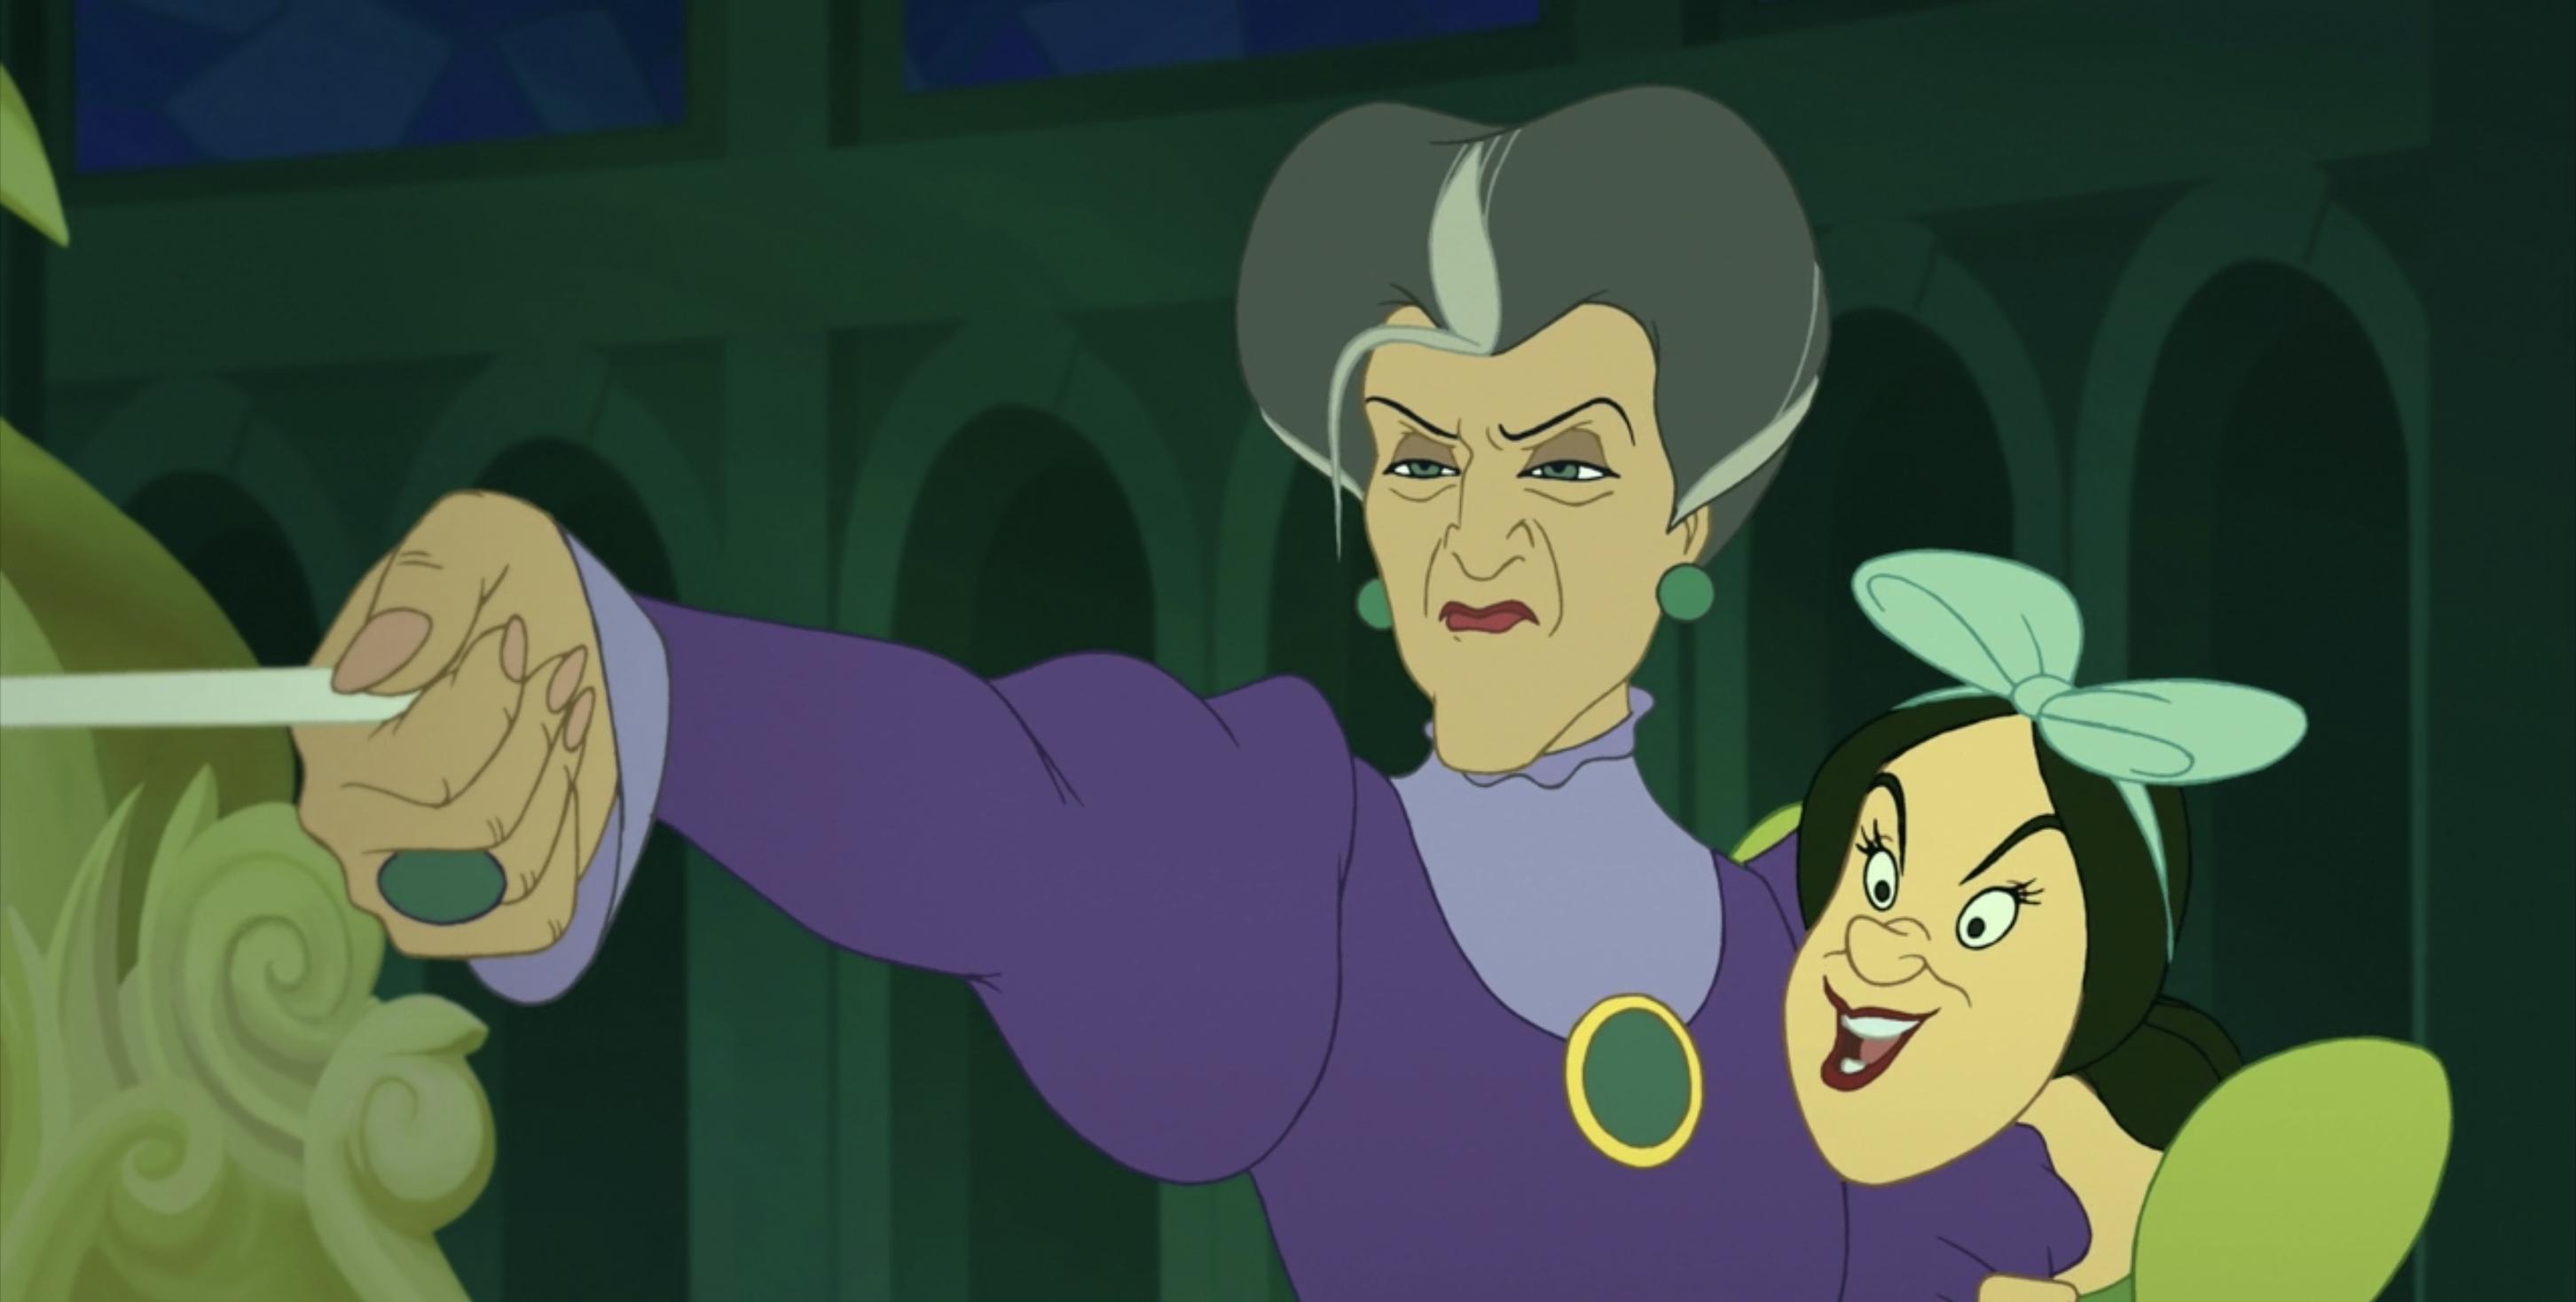 Lady Tremaine using the magic wand